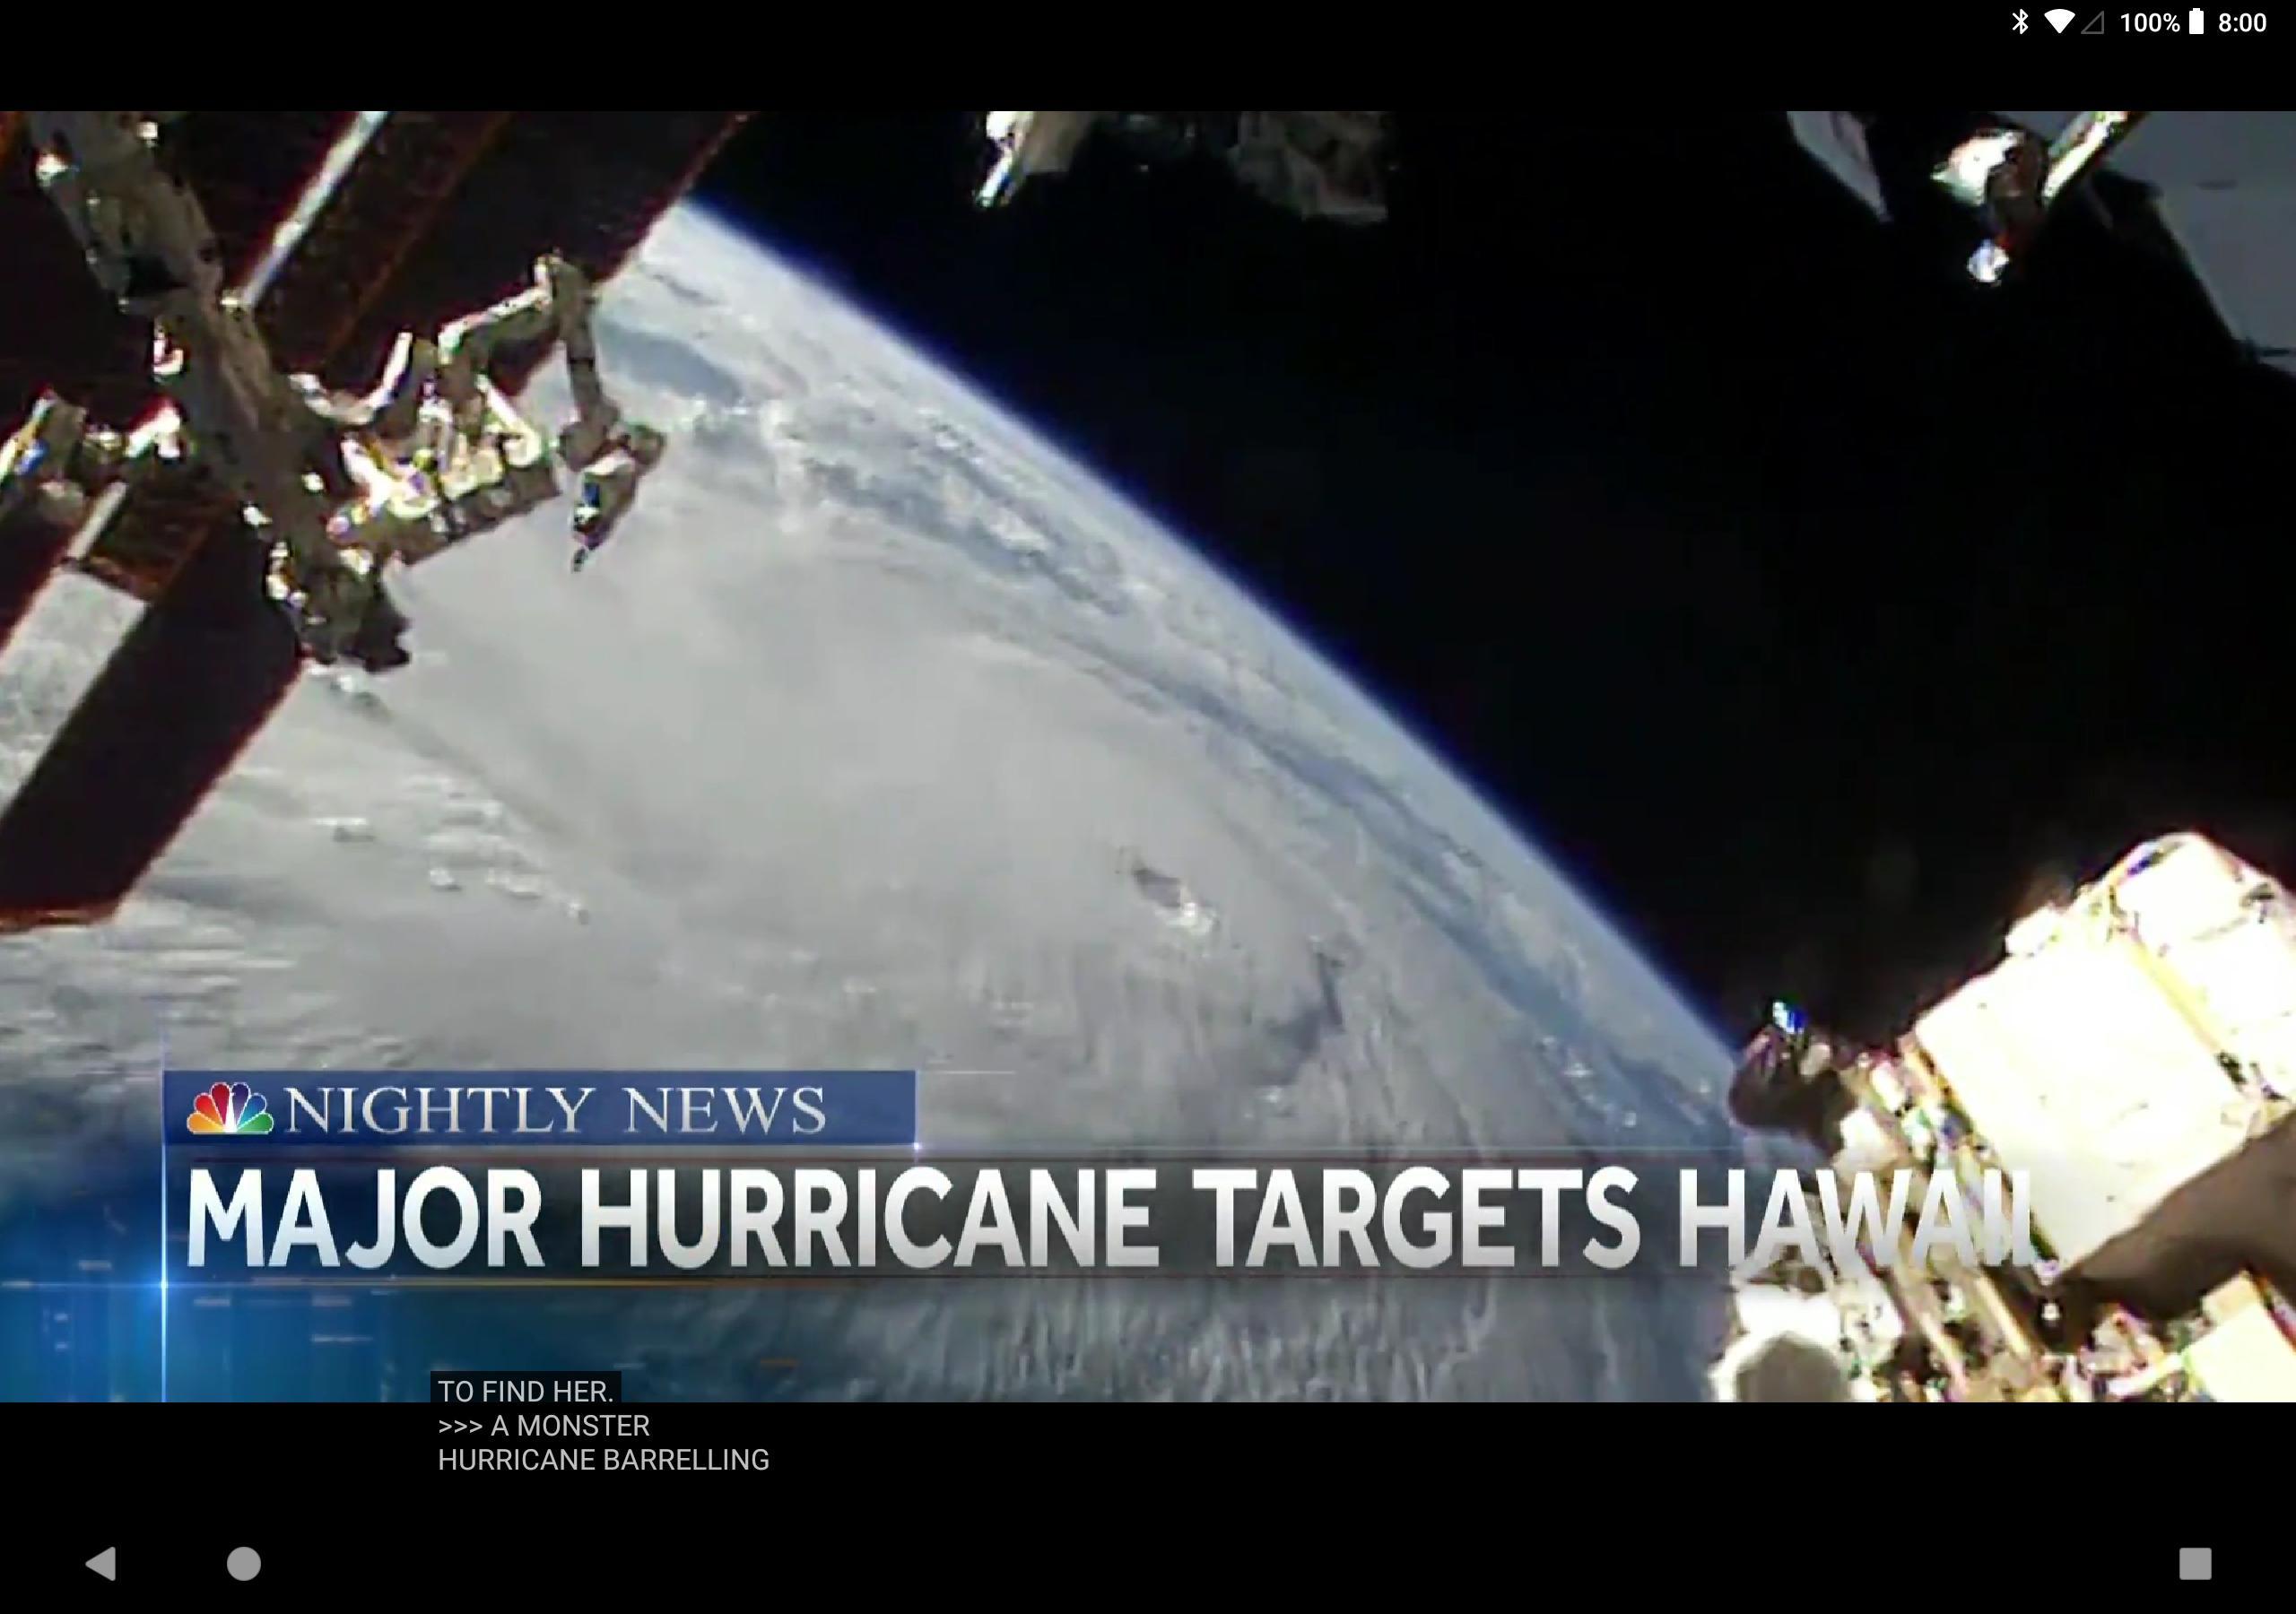 NBC News: Breaking News, US News & Live Video 6.0.11 Screenshot 11